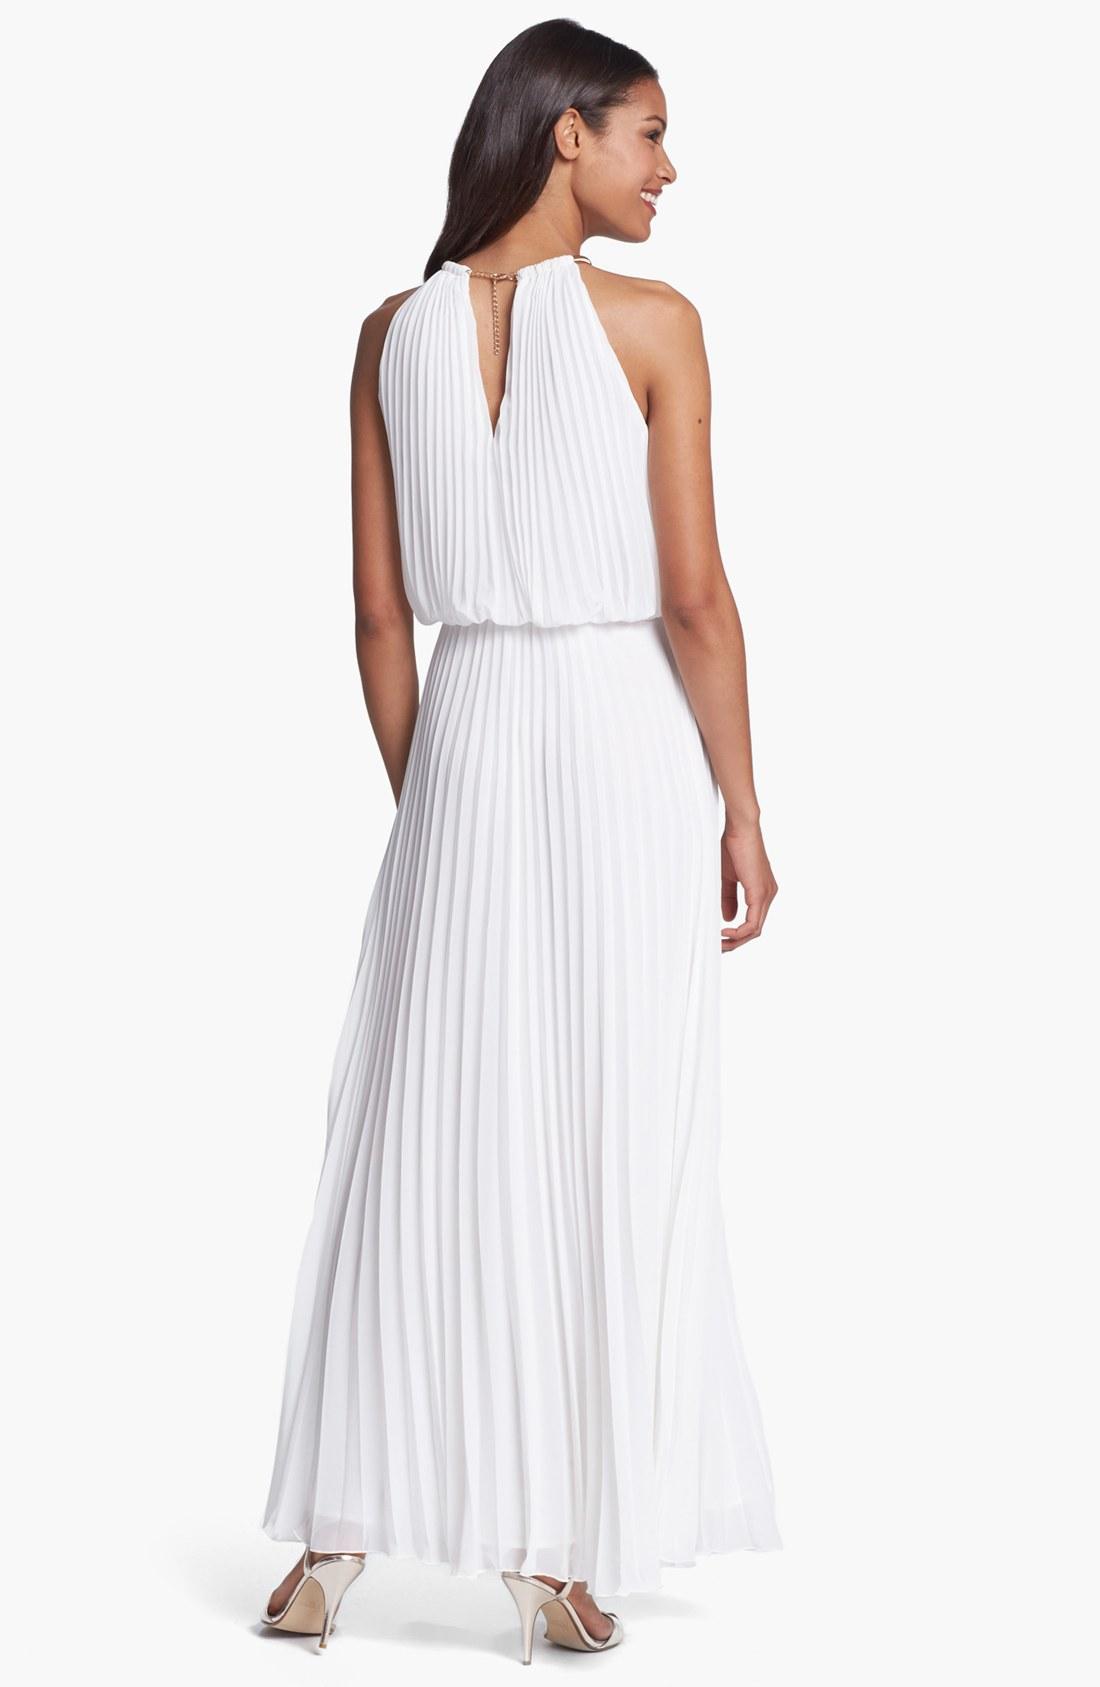 Xscape Dresses Website _Other dresses_dressesss